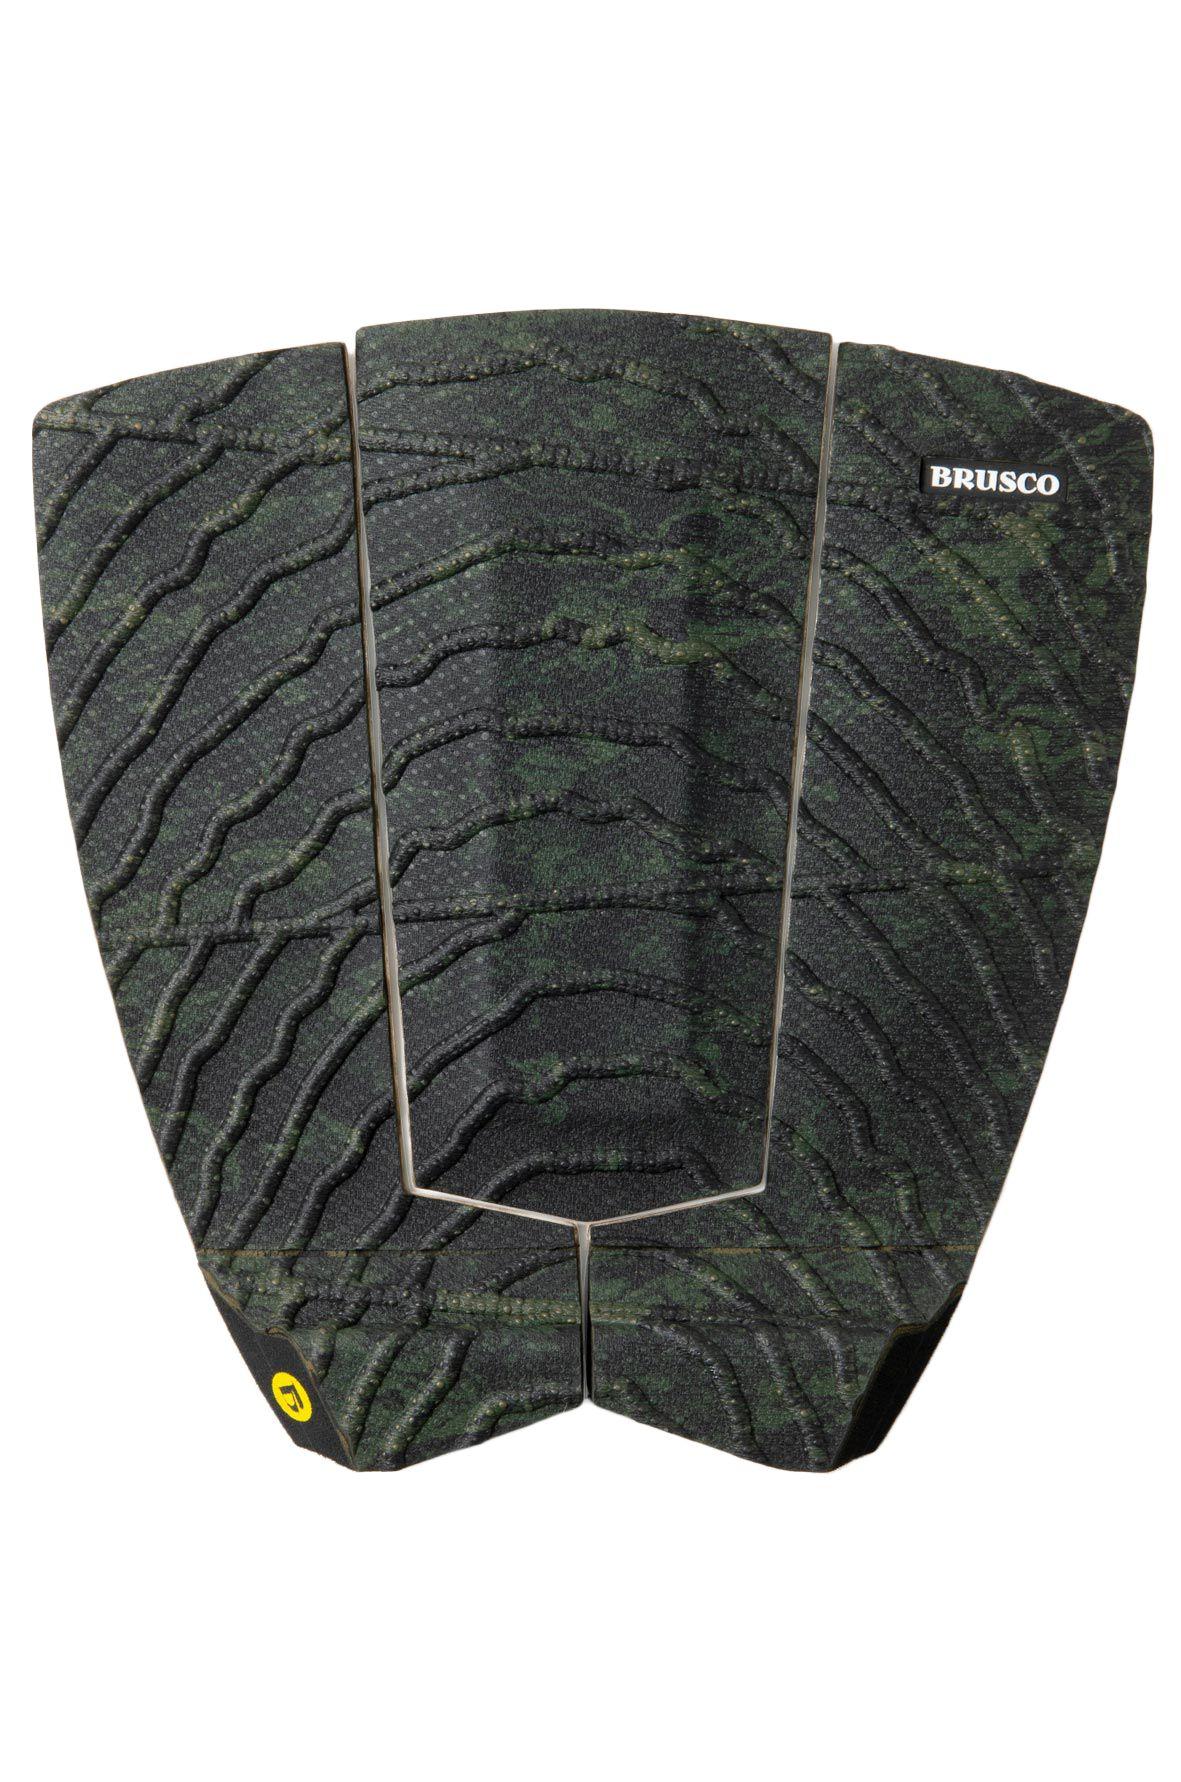 Deck Brusco TAILPAD RUGGED GRIP SEAWEED 3PCS Green/Black